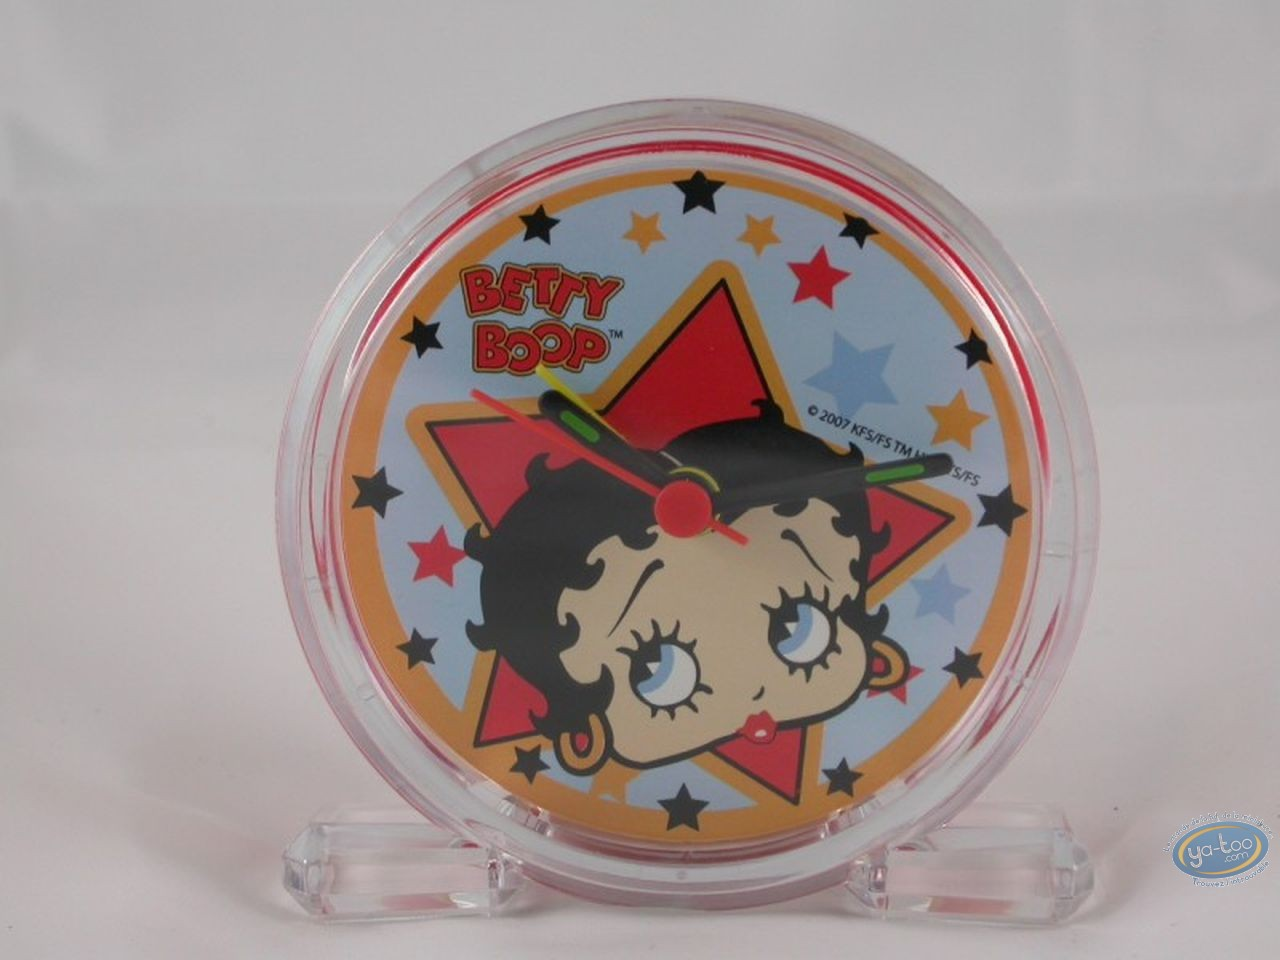 Clocks & Watches, Betty Boop : Little alarm clock : Betty Boop 'Star'.